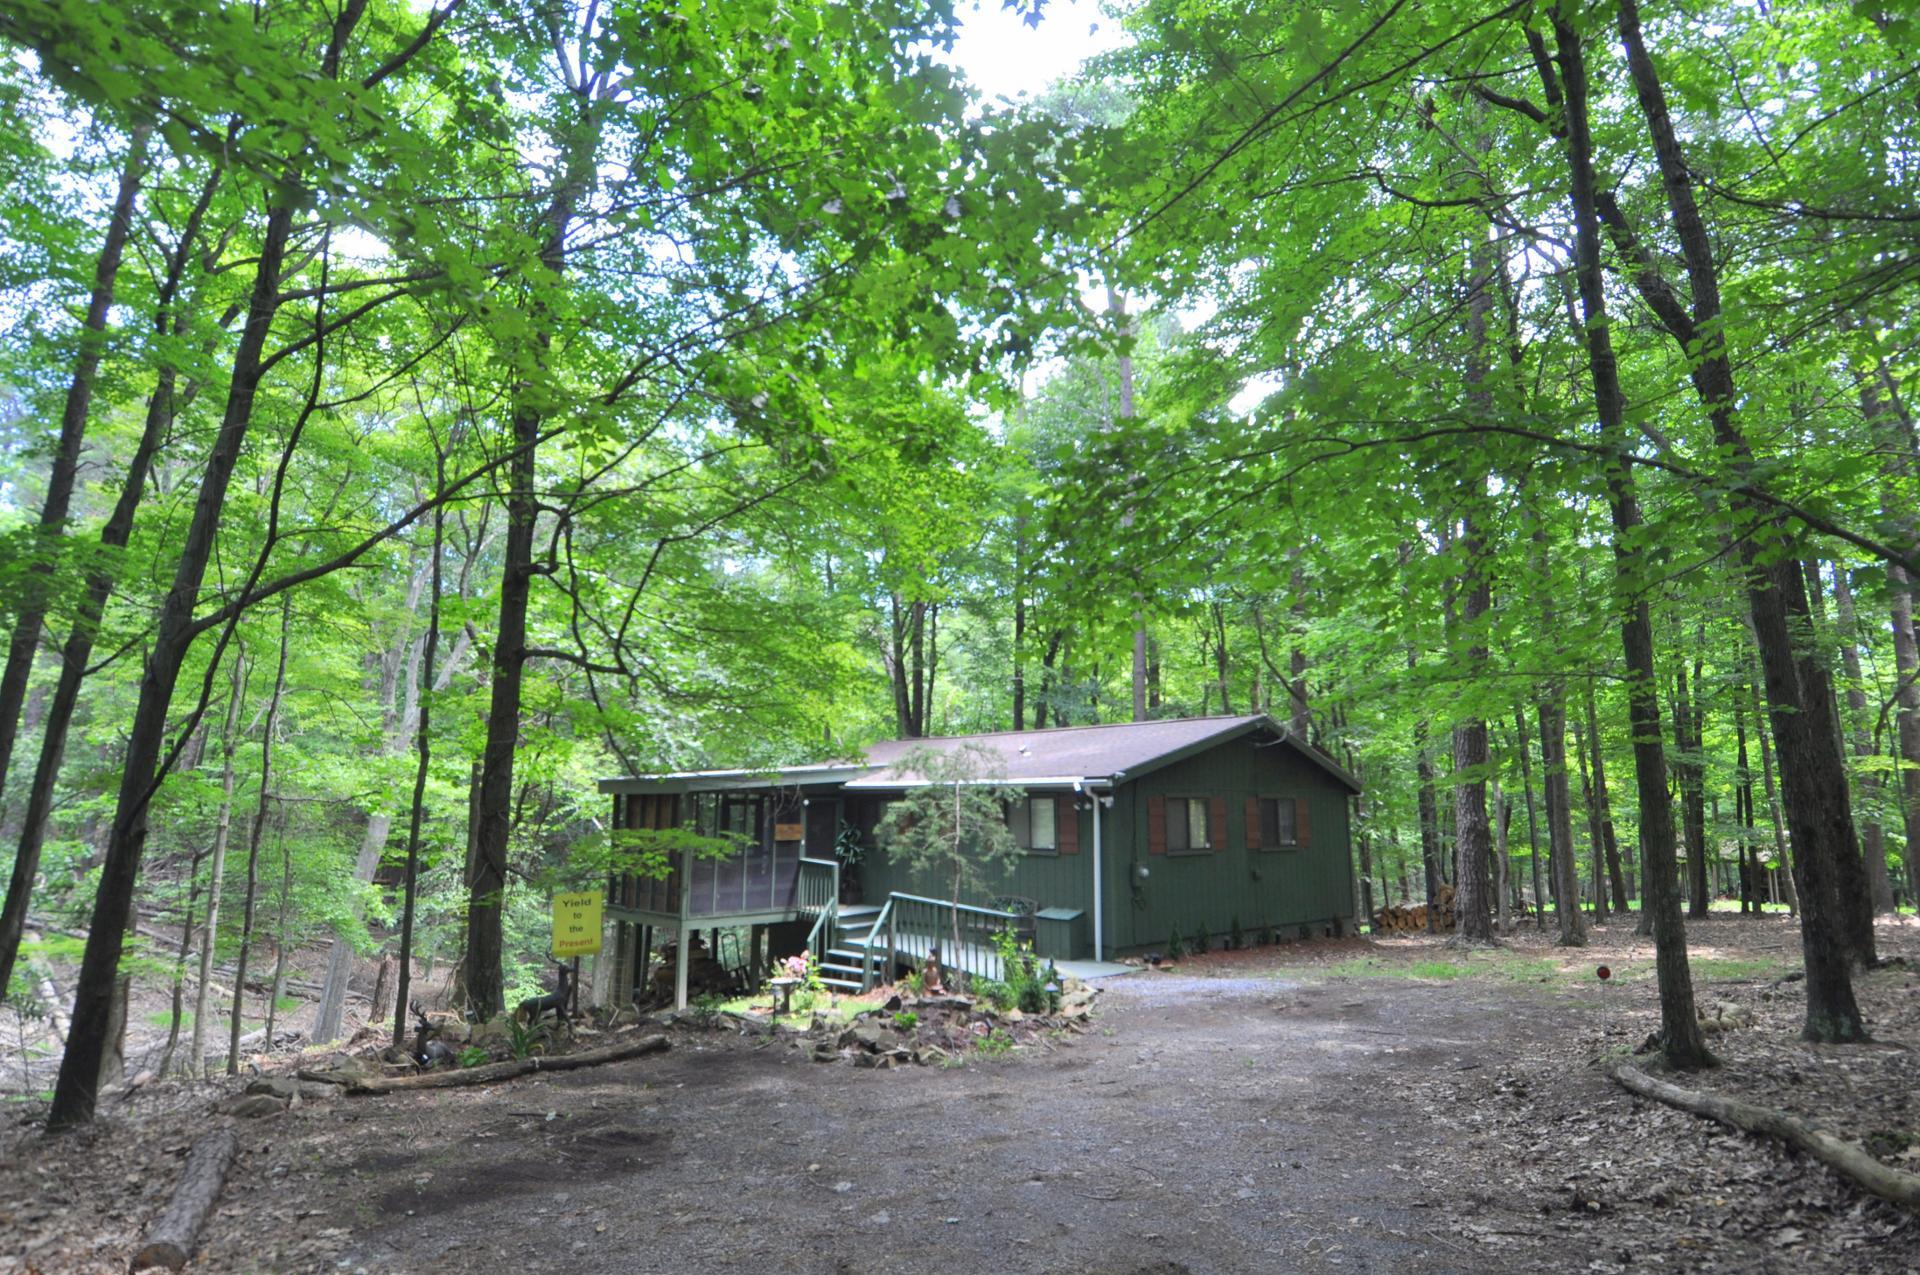 A Zen Mountain Retreat rental home at Berkeley Springs Cottage Rentals in Berkeley Springs West Virginia